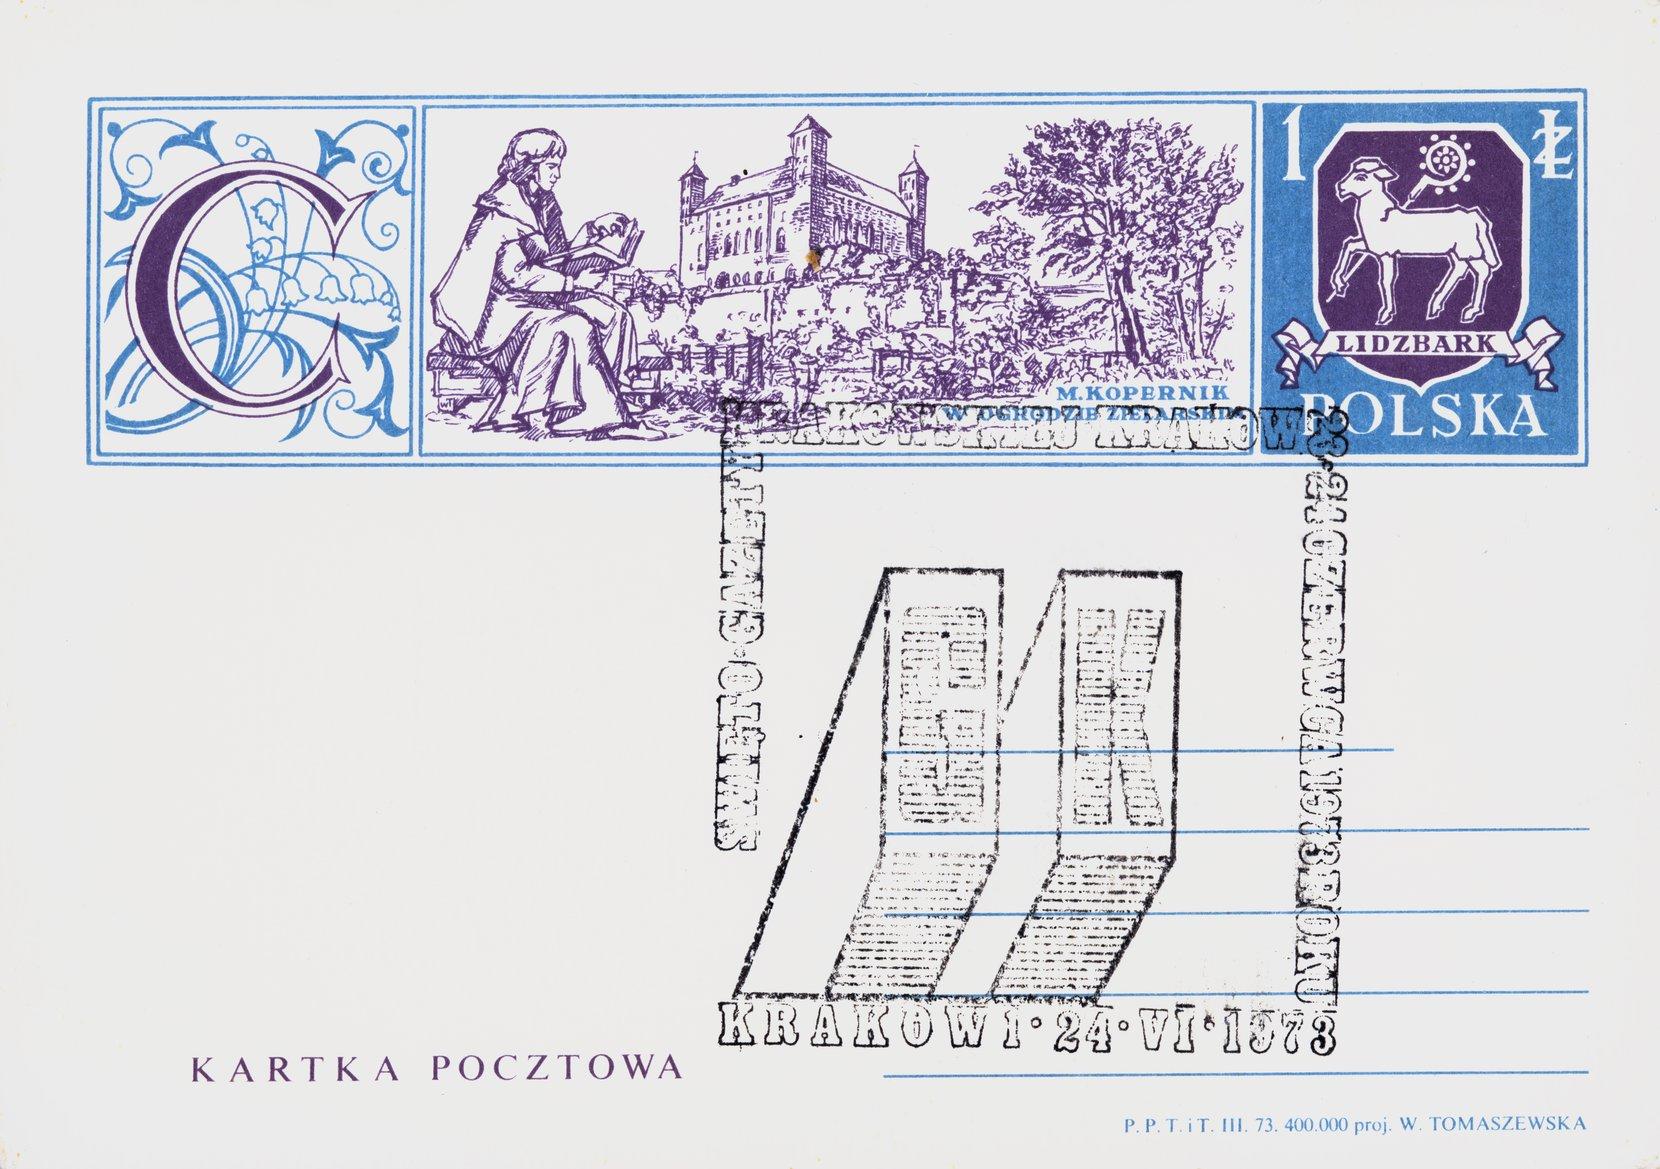 the gazeta krakowska festival postal card philately postal cards